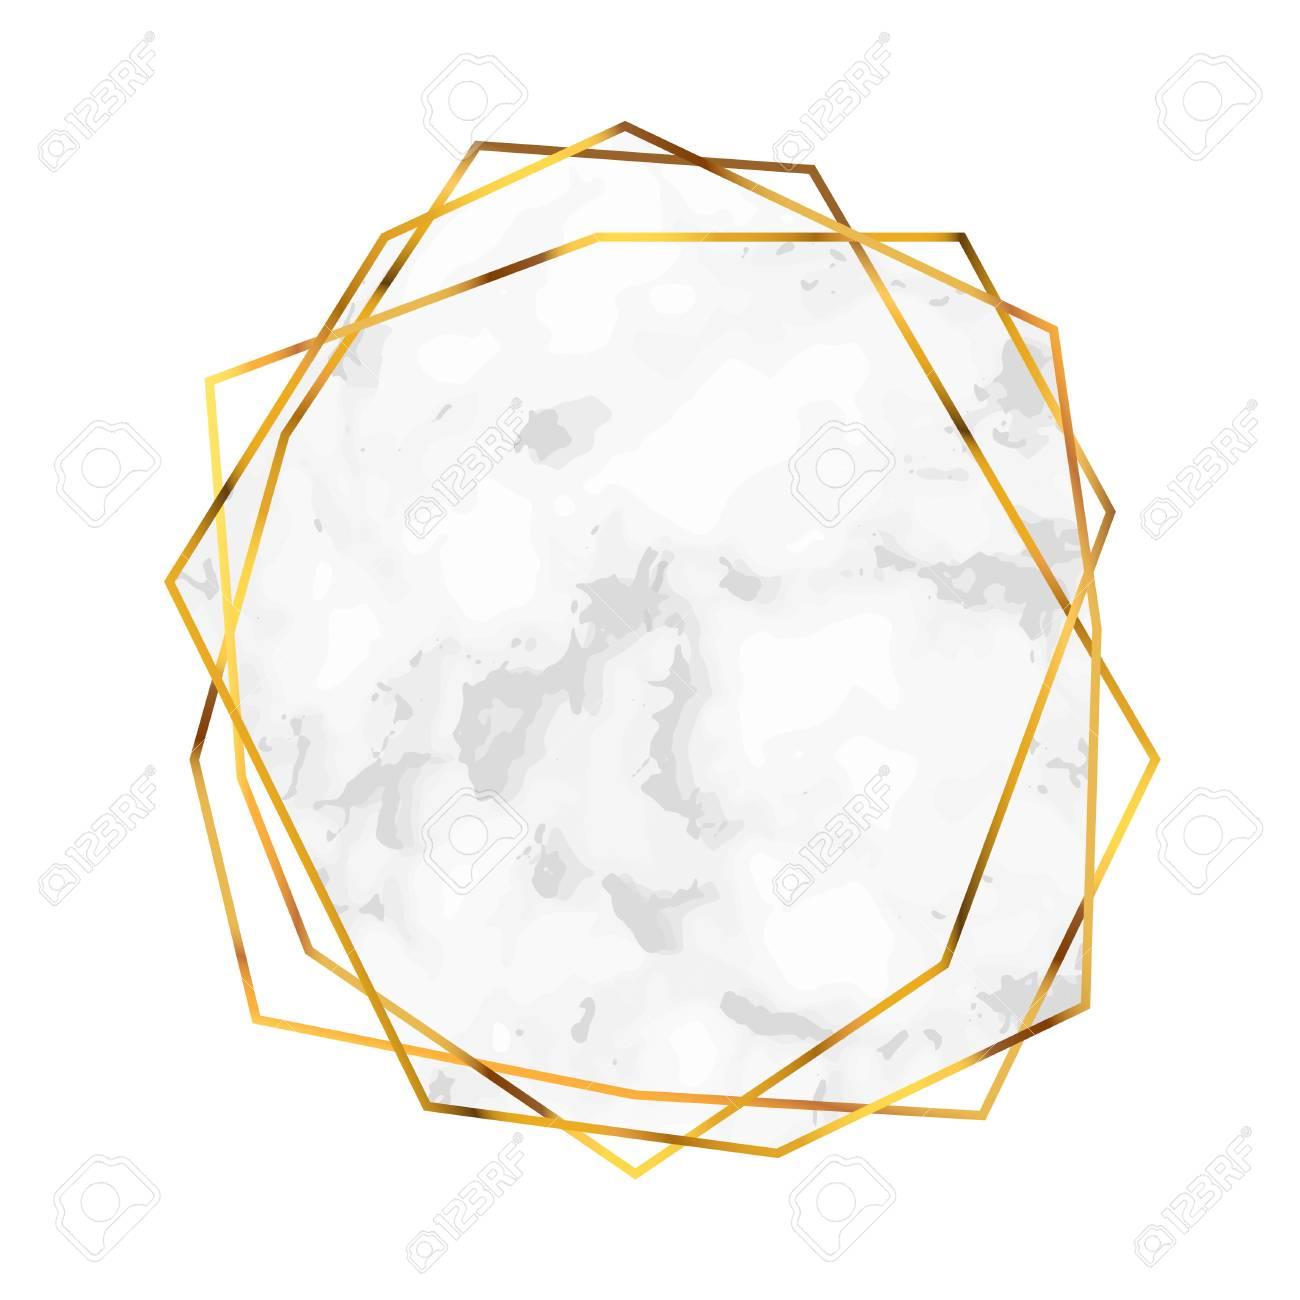 polygonal diamond shape abstract marble shape design template